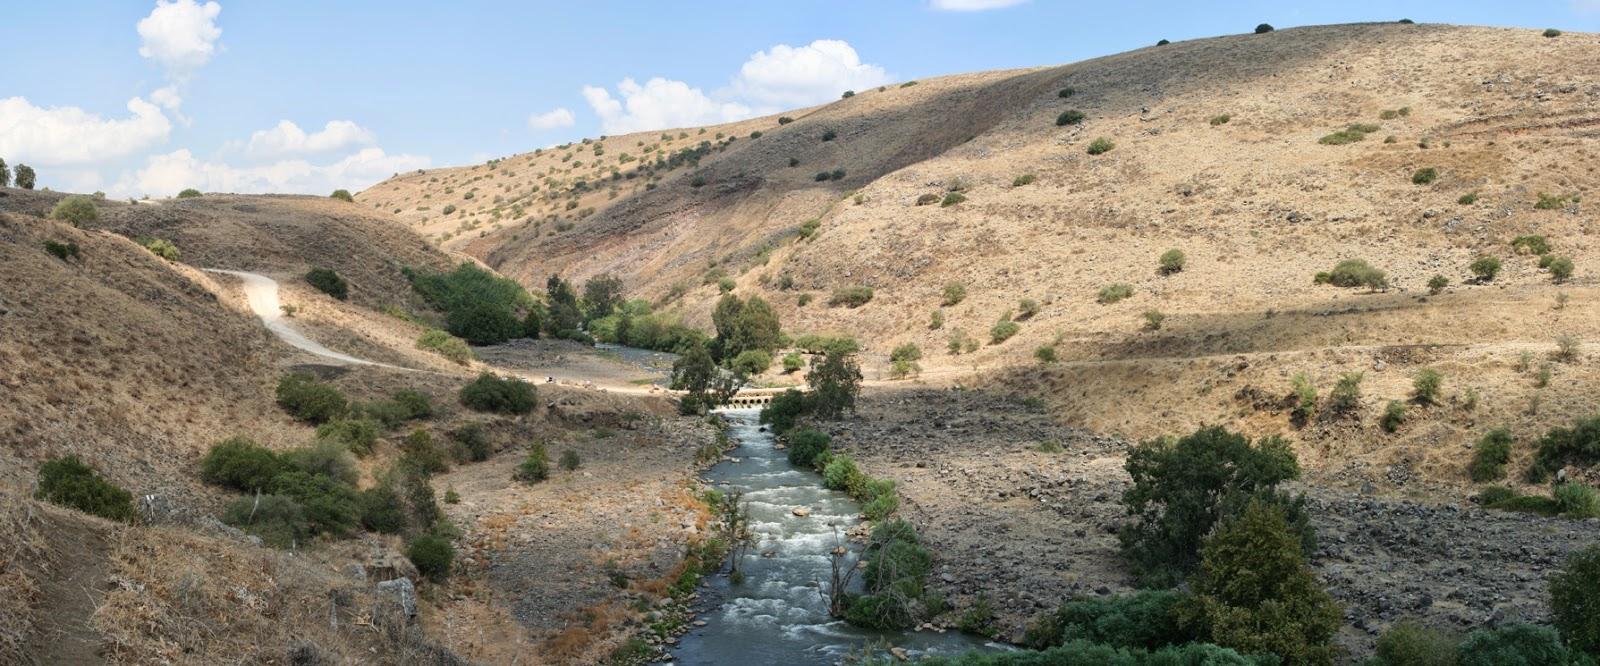 http://www.newscientist.com/article/dn25469-multifaith-bid-to-save-river-jordan-may-inspire-peace.html#.U2S6cFcglSn